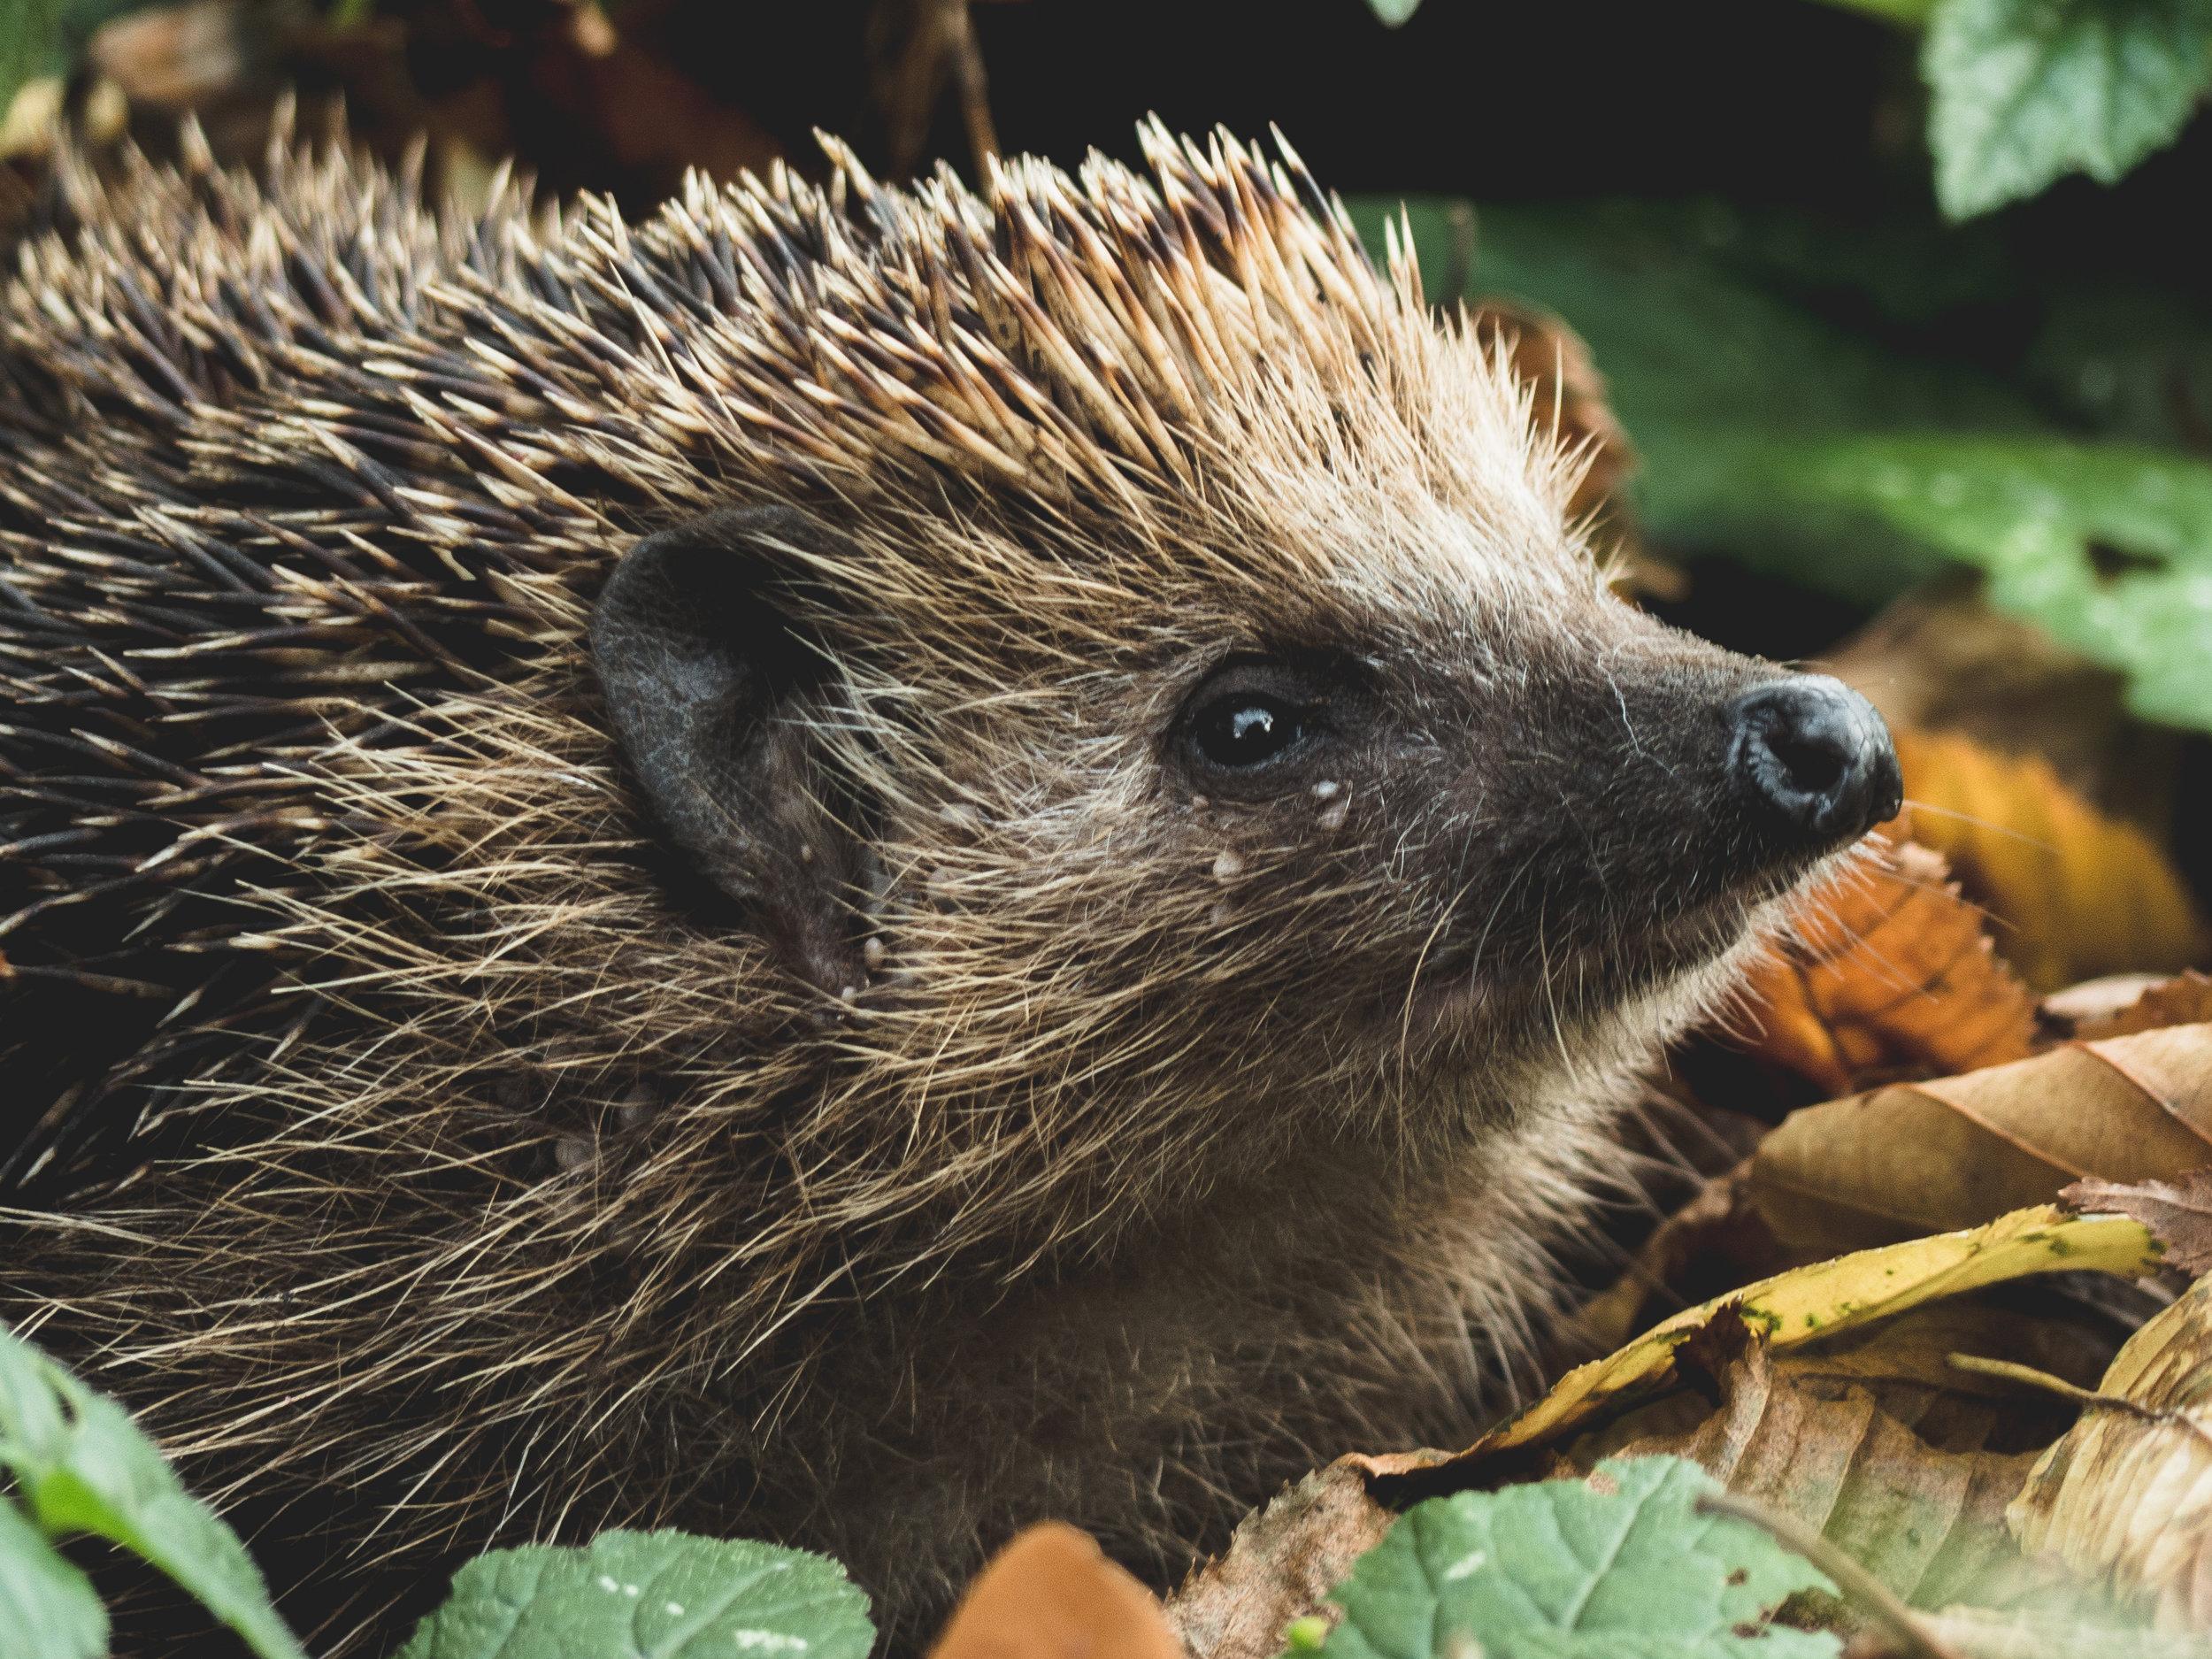 Our local Hedgehogs will appreciate it!